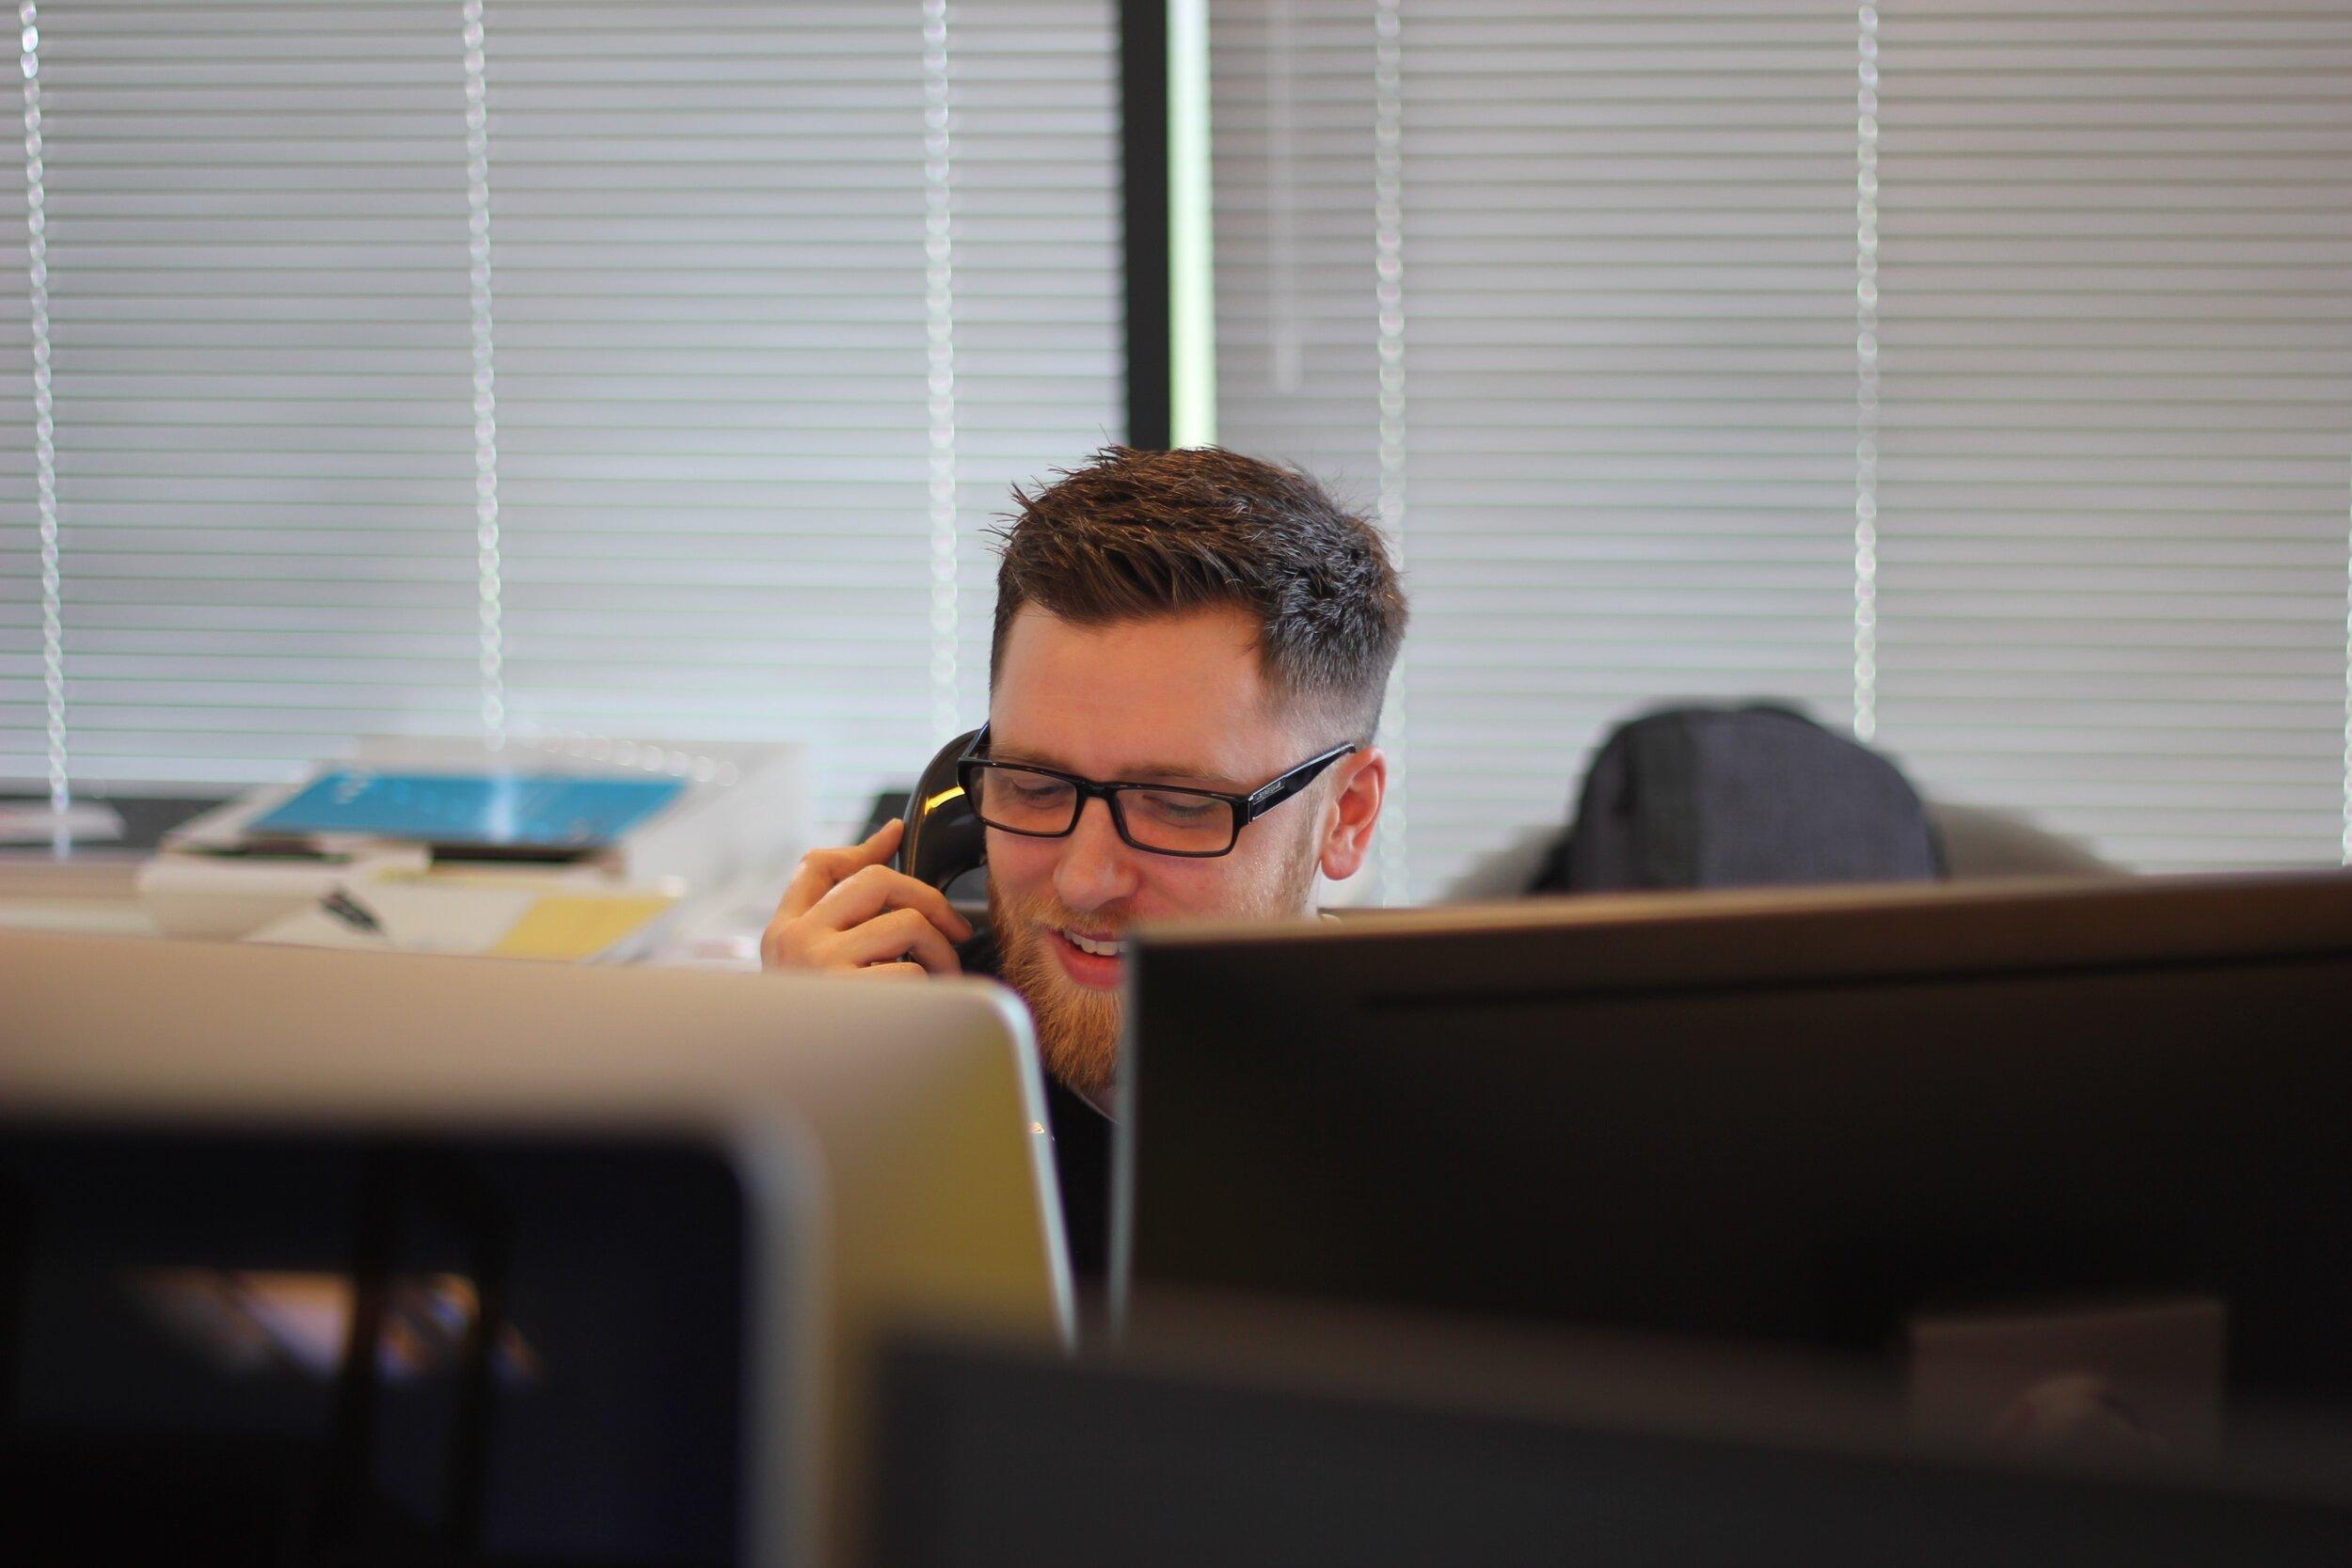 Man talking on phone.jpg